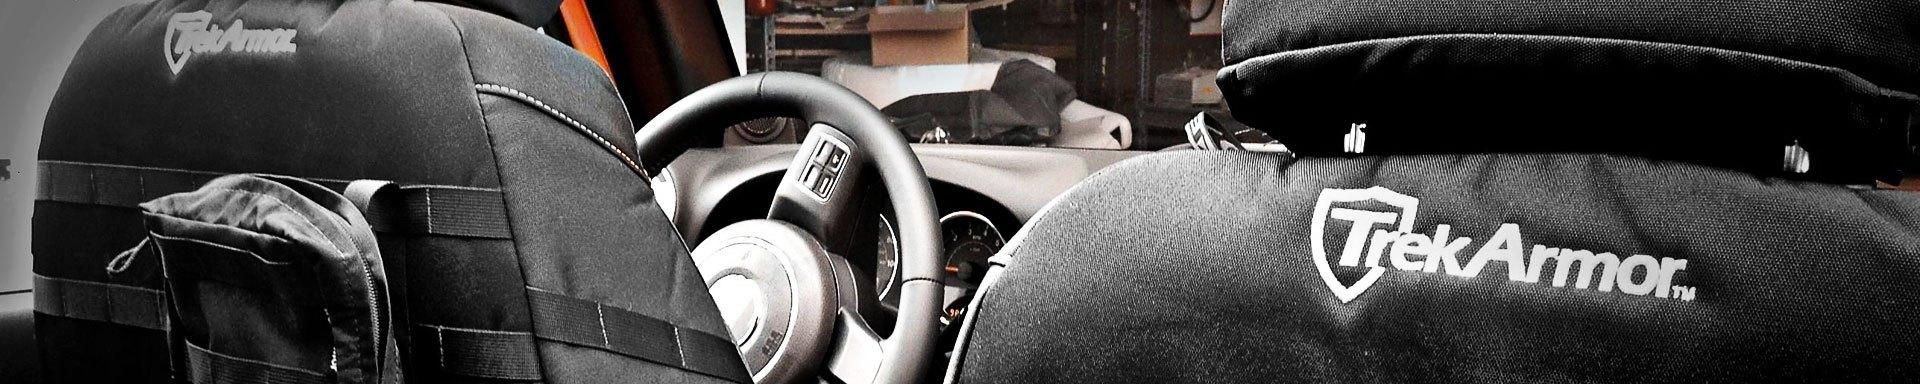 Bartact Seat Covers Grab Handles Accessories Carid Com